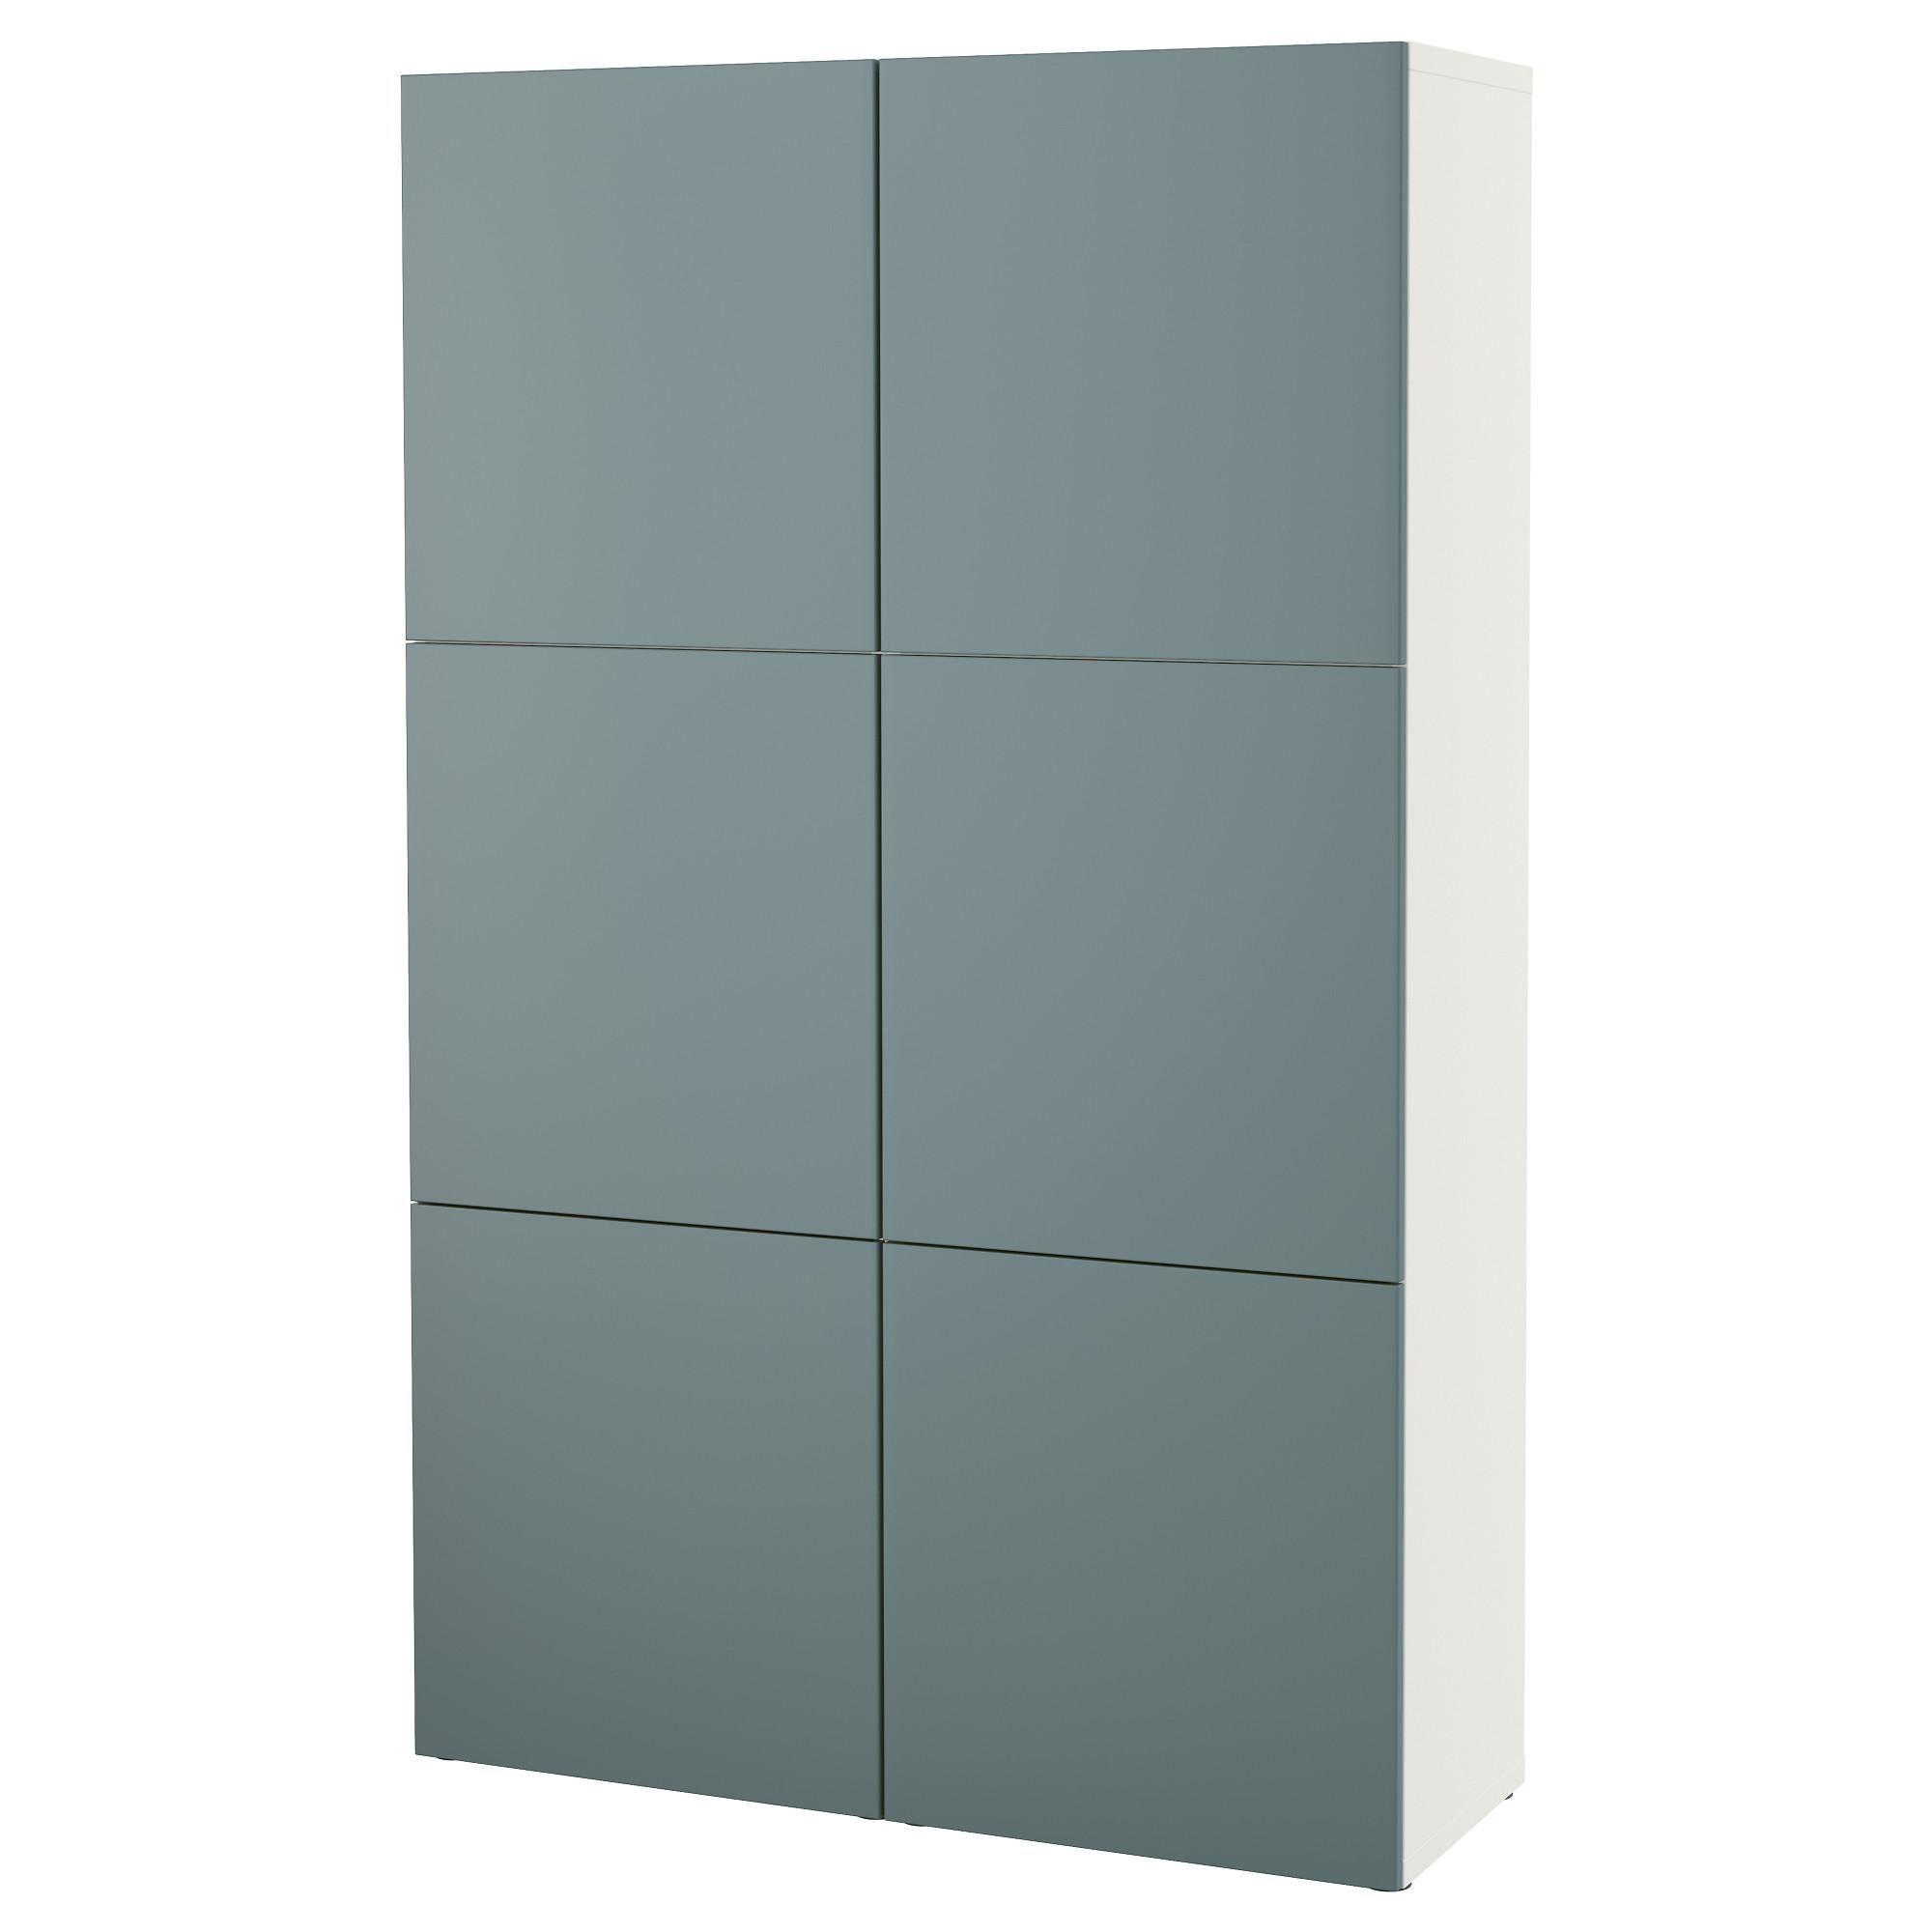 Комбинация для хранения с дверцами БЕСТО белый артикуль № 092.471.58 в наличии. Online каталог IKEA Беларусь. Недорогая доставка и соборка.